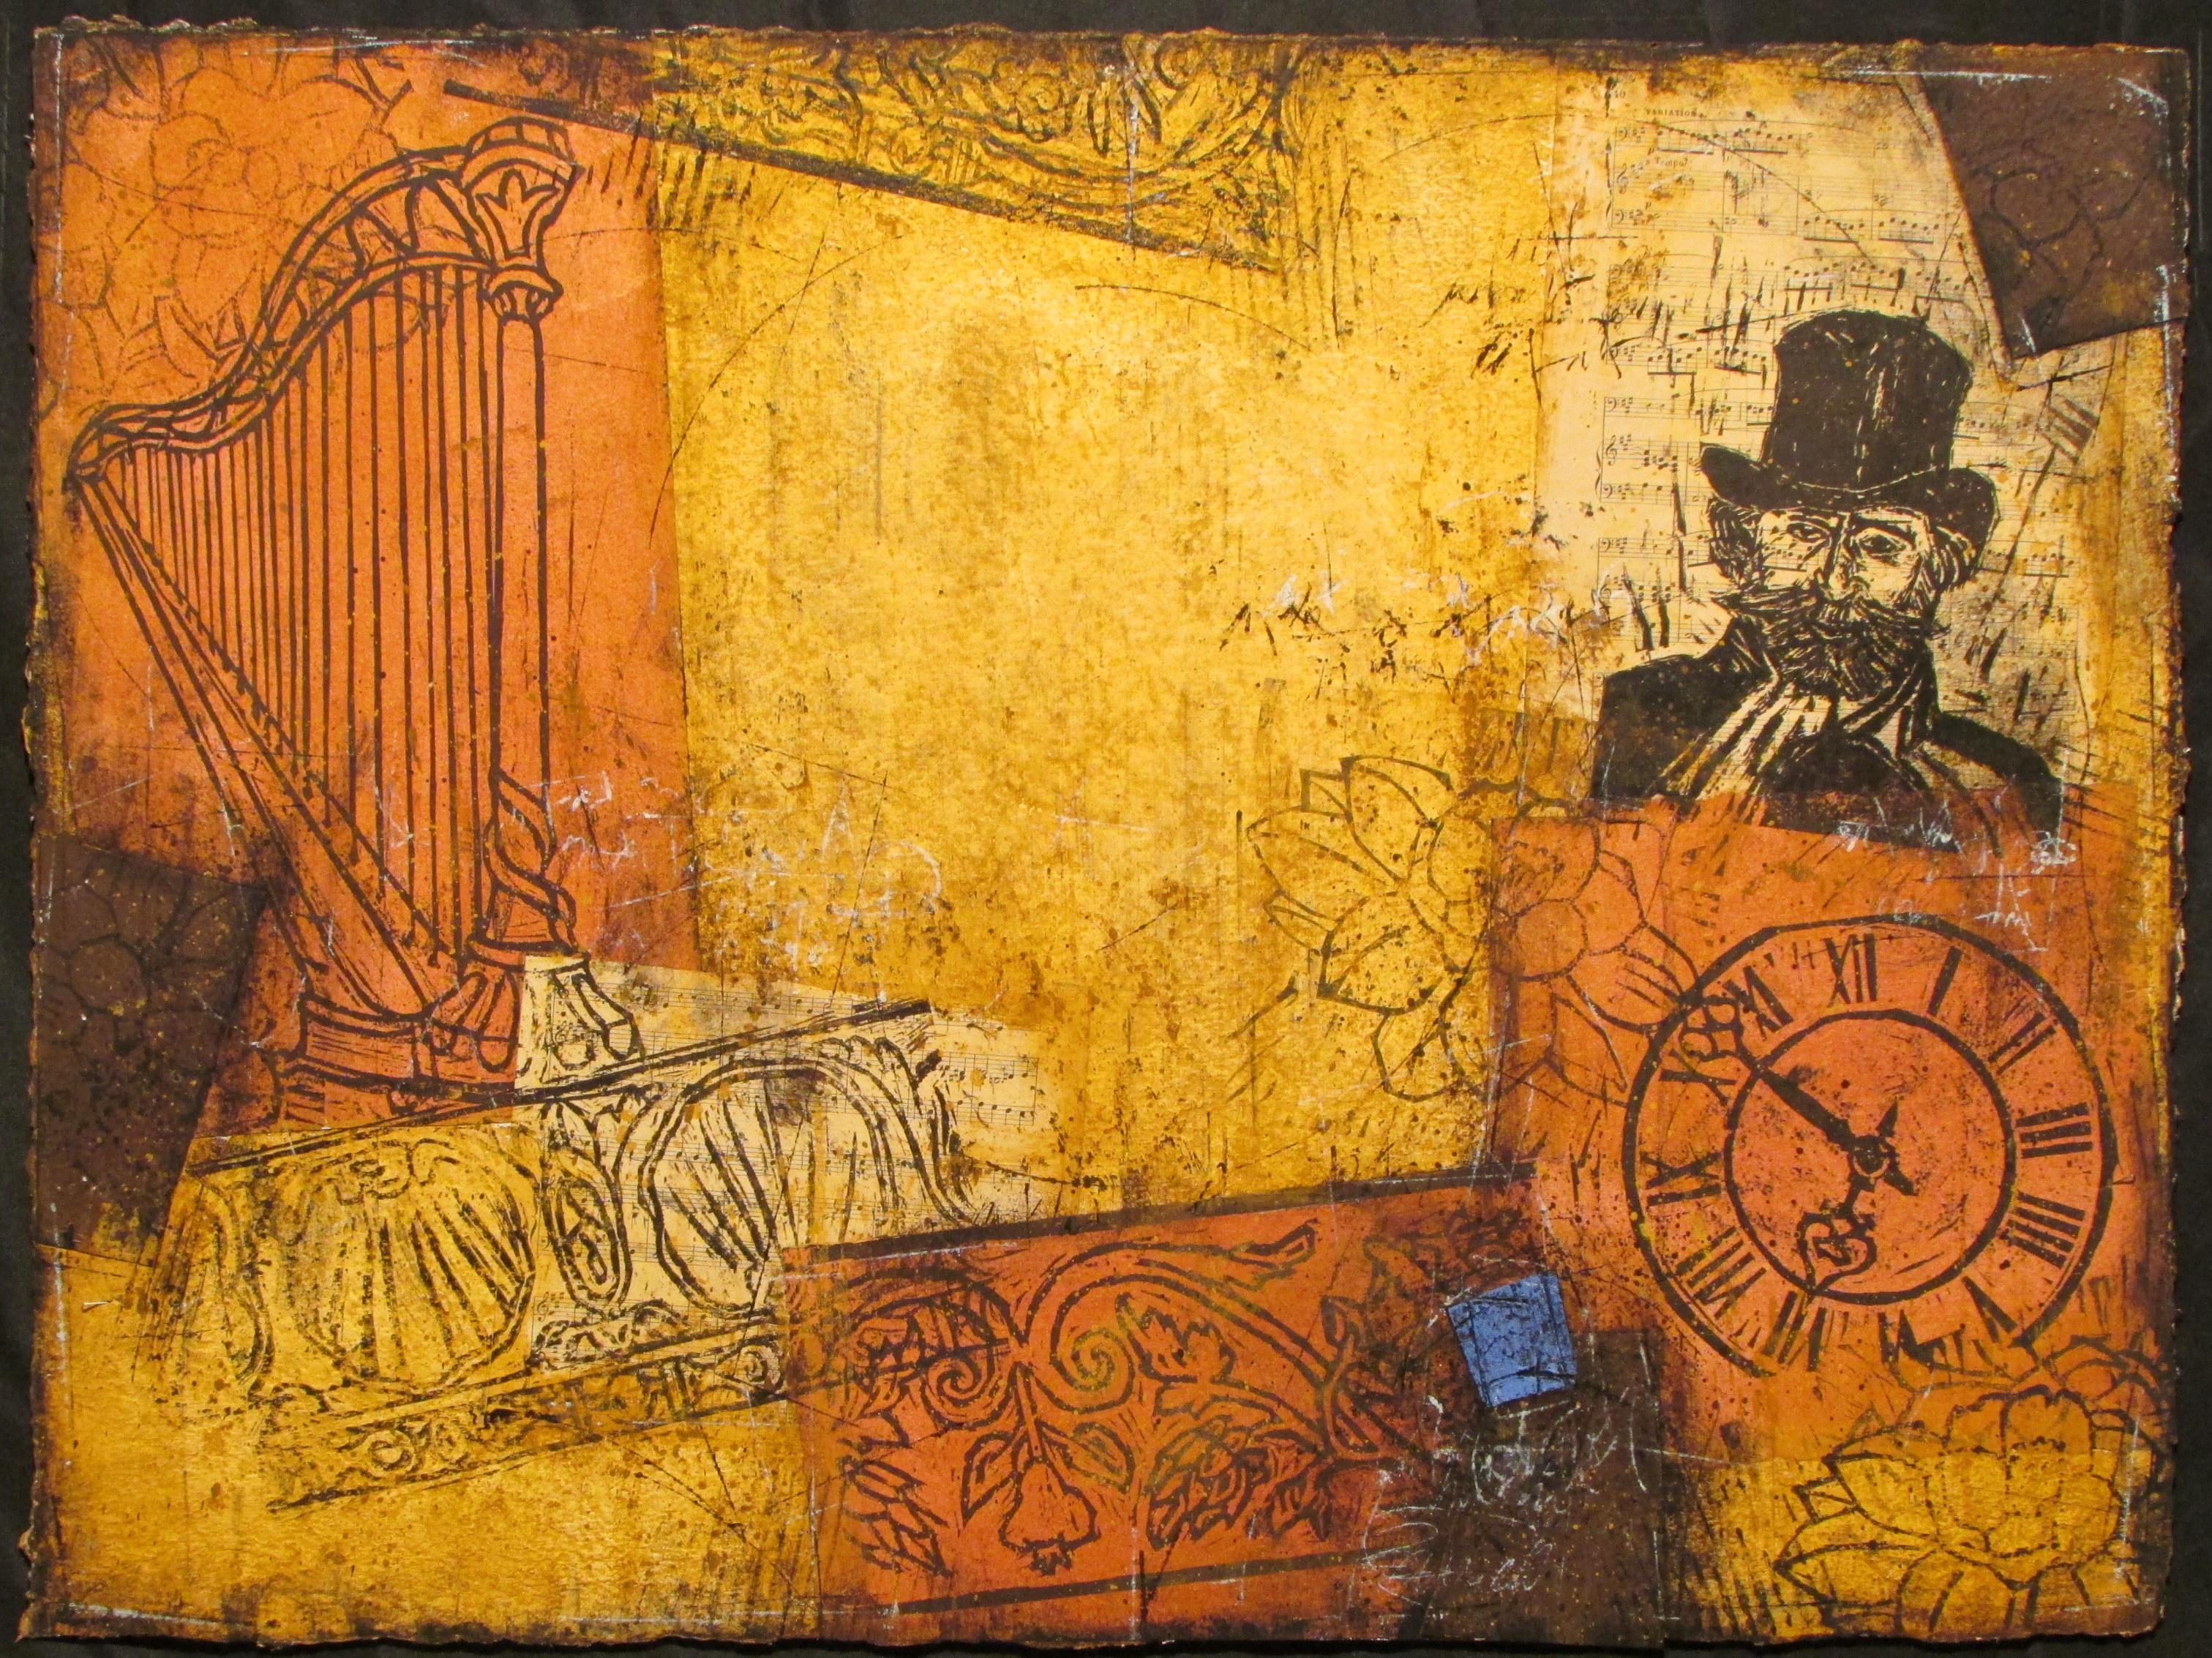 0006_Hommage_à_Verdi__n°_VI_(60x80cm)